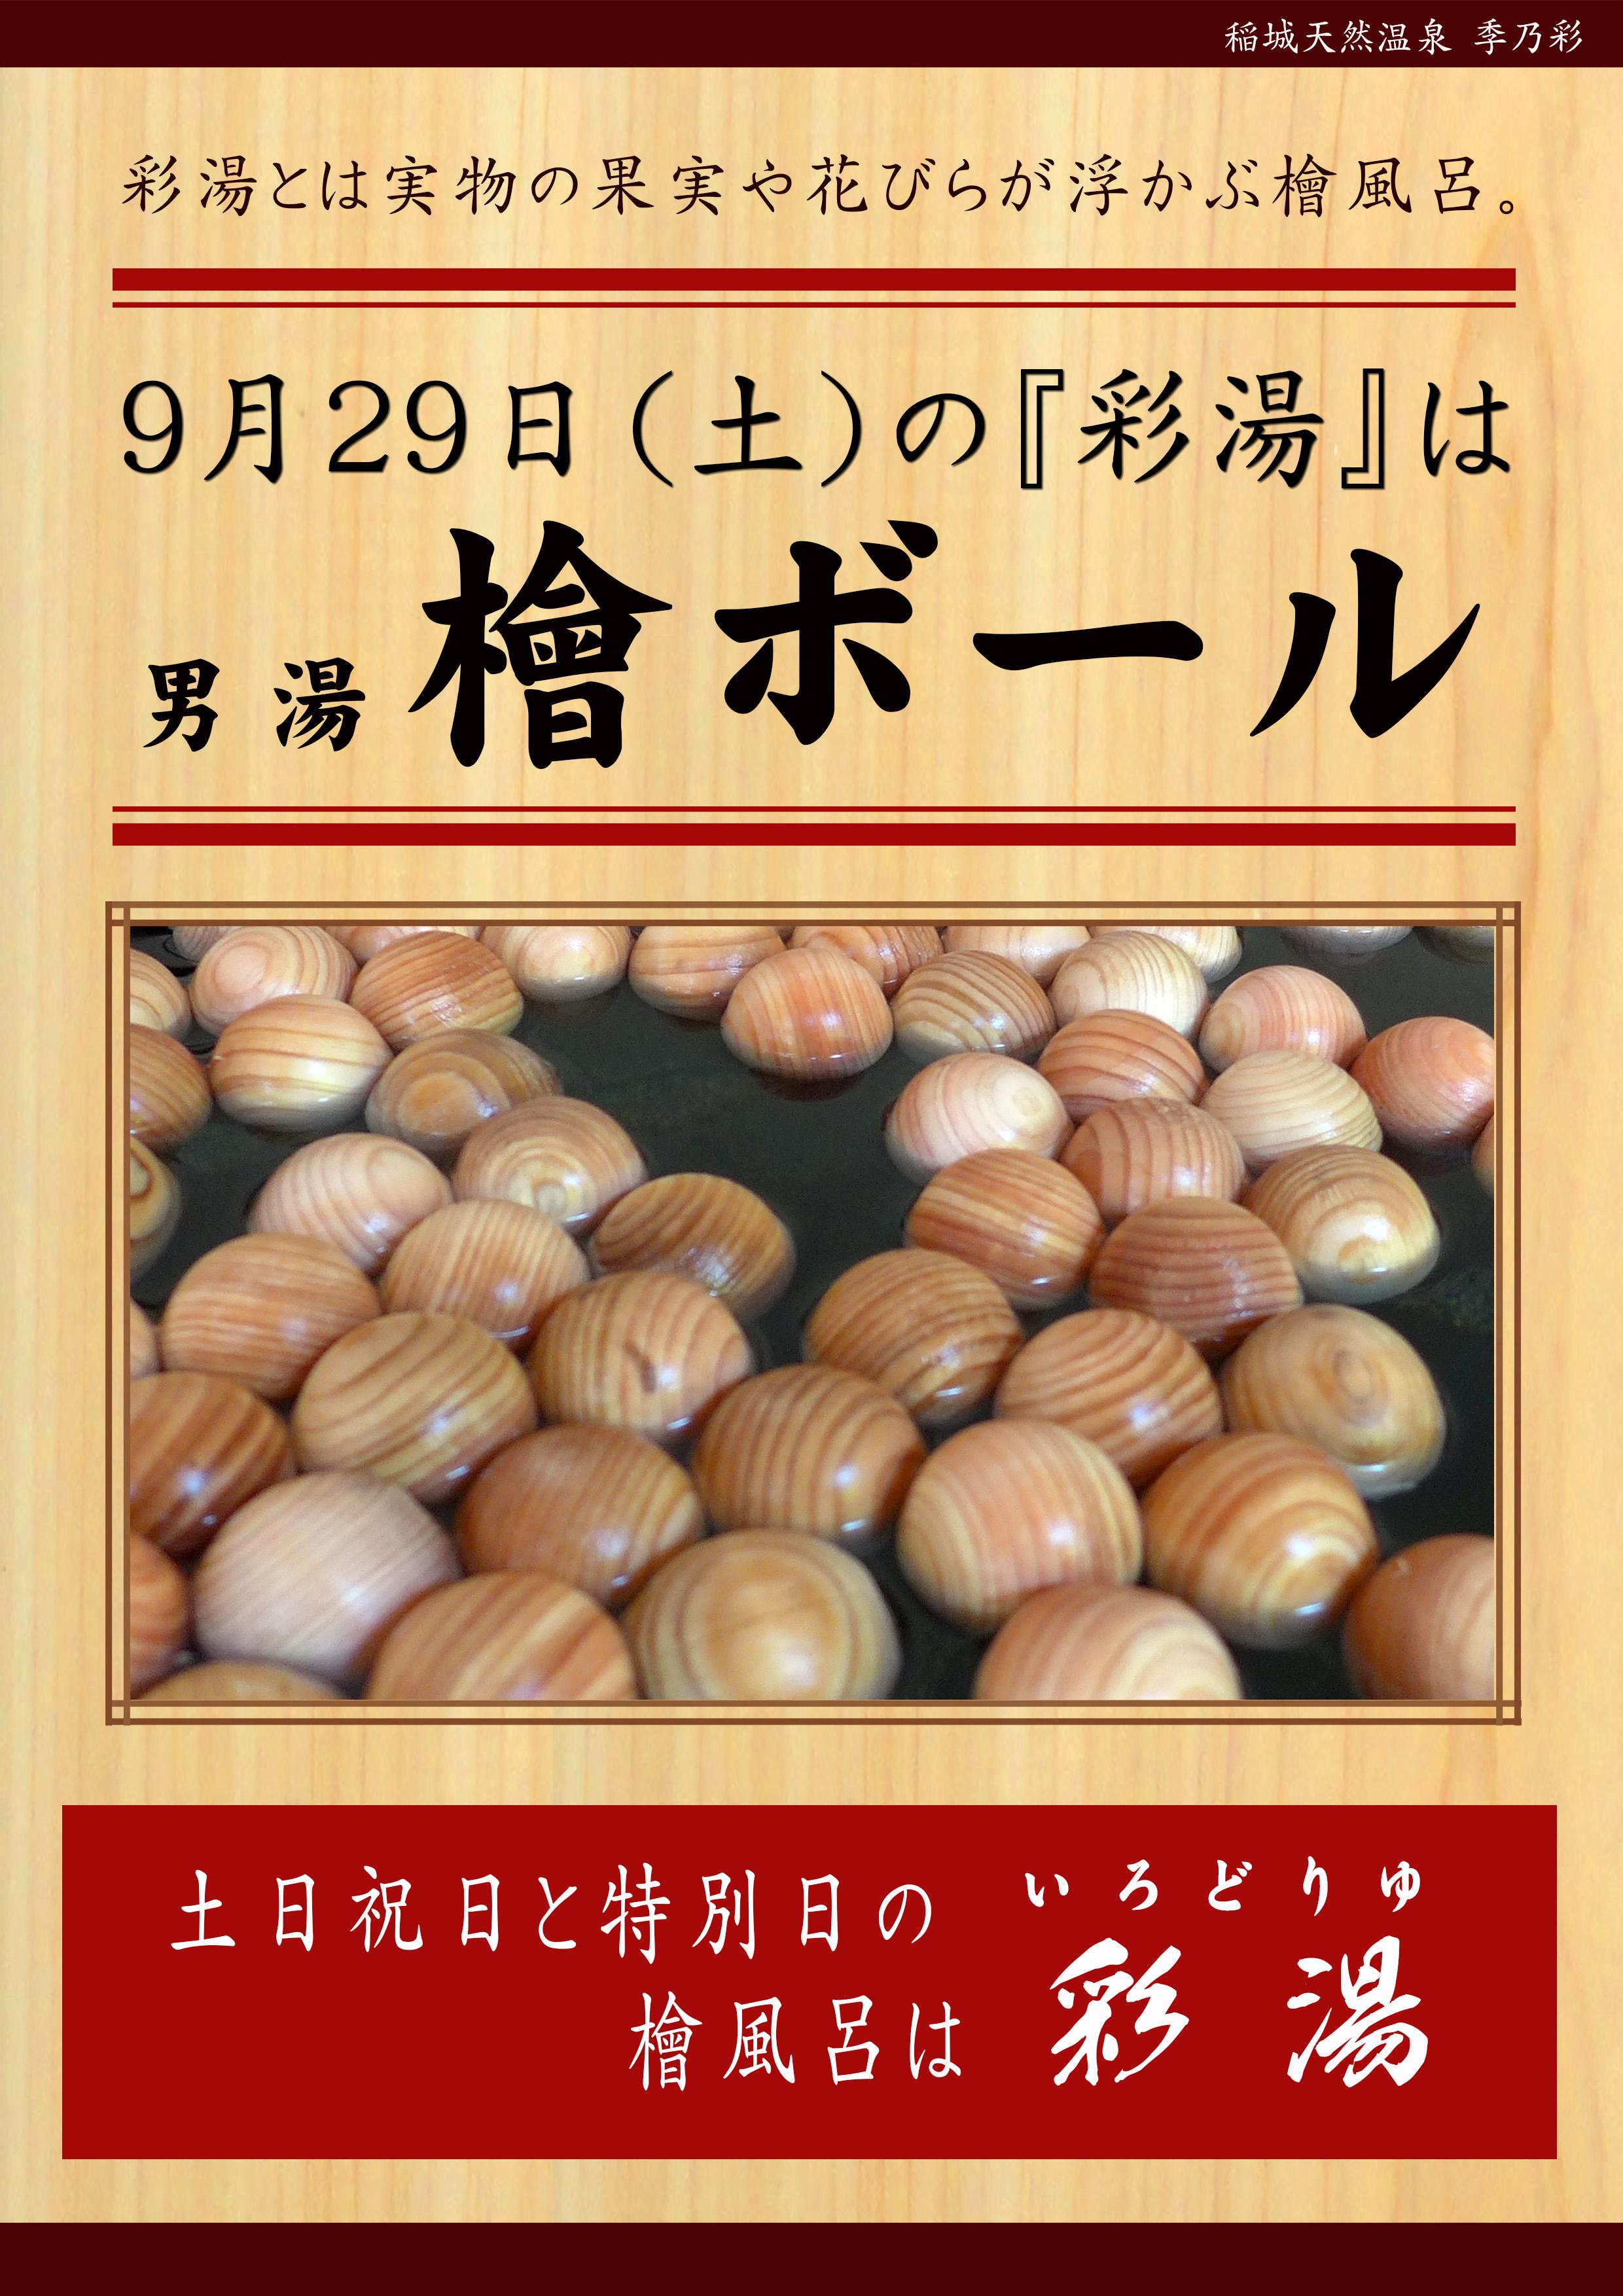 20180929POP イベント 彩湯 男湯 檜ボール